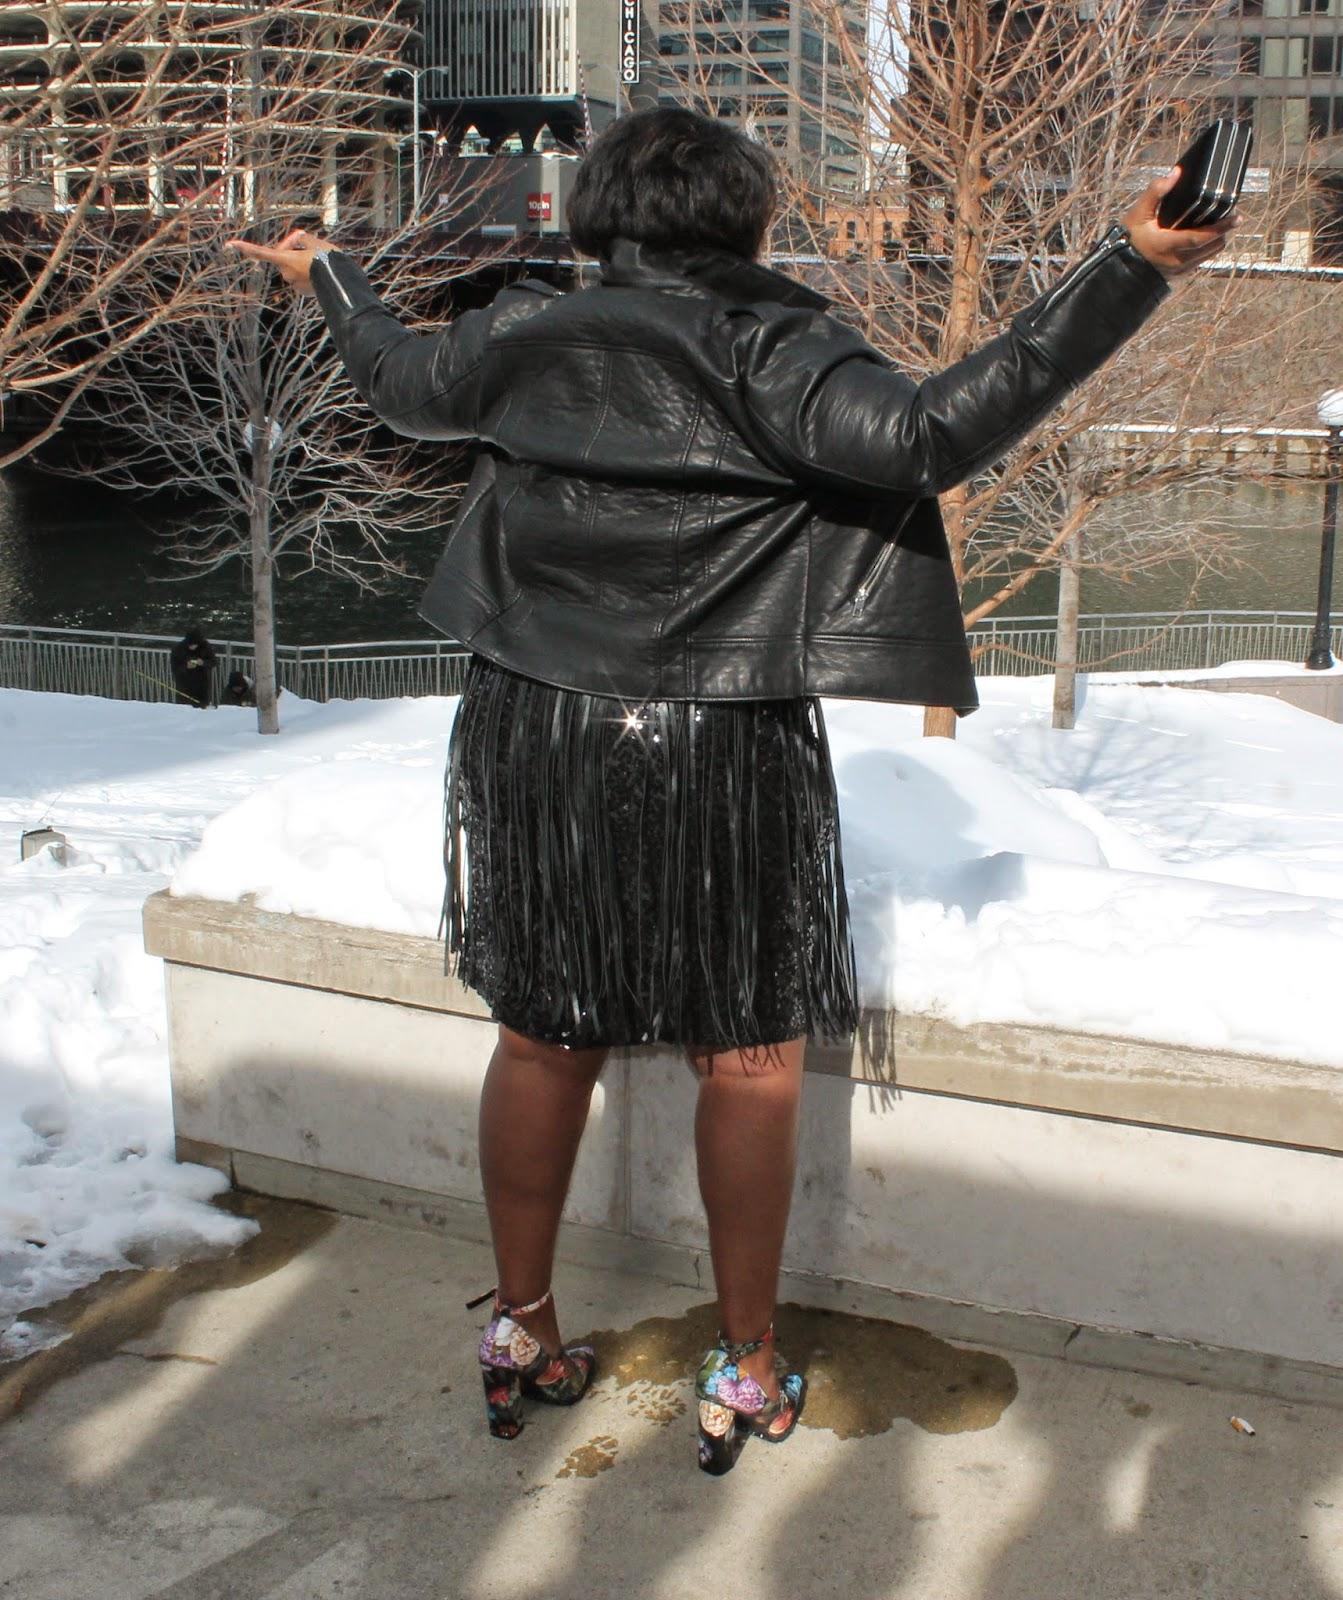 Valentines Day Style Rocker Chic Plus Size Sequins Fringe Floral Block Heel Pump